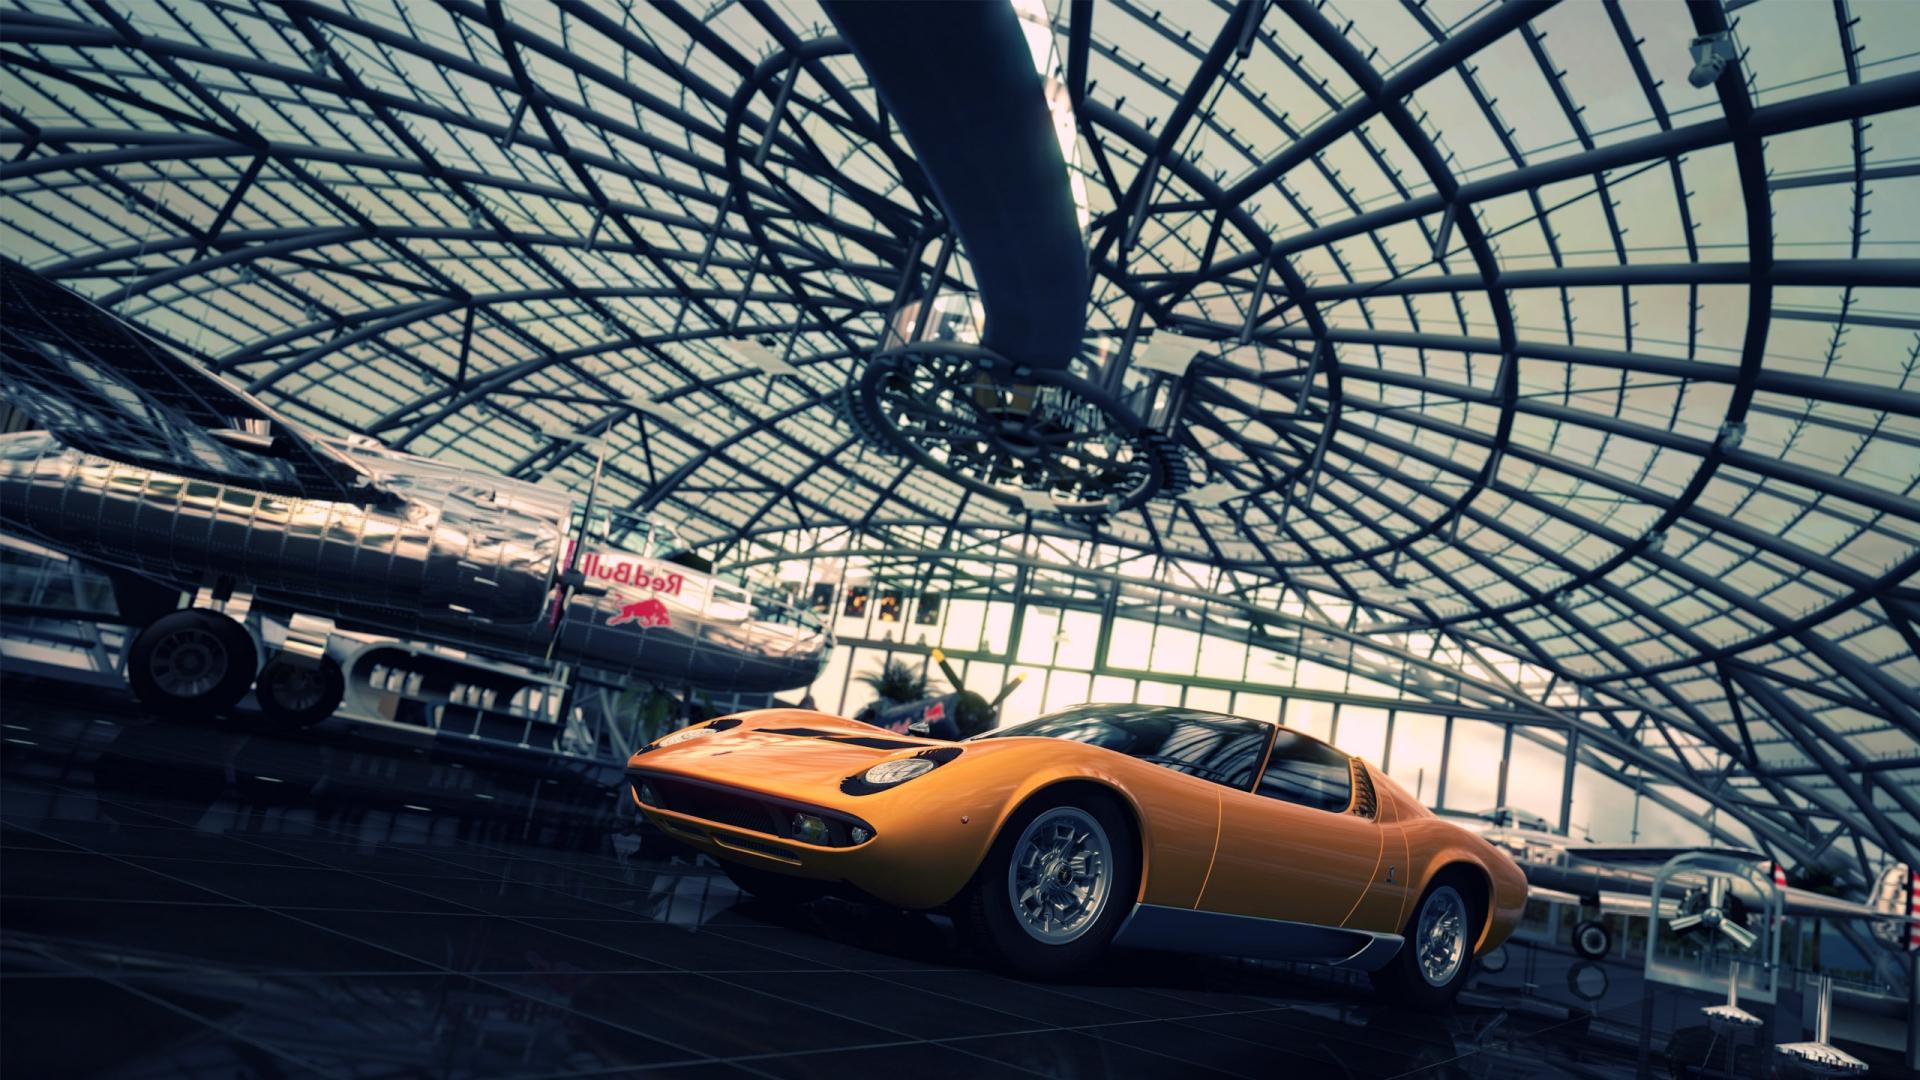 12 Lamborghini Miura HD Wallpapers Background Images